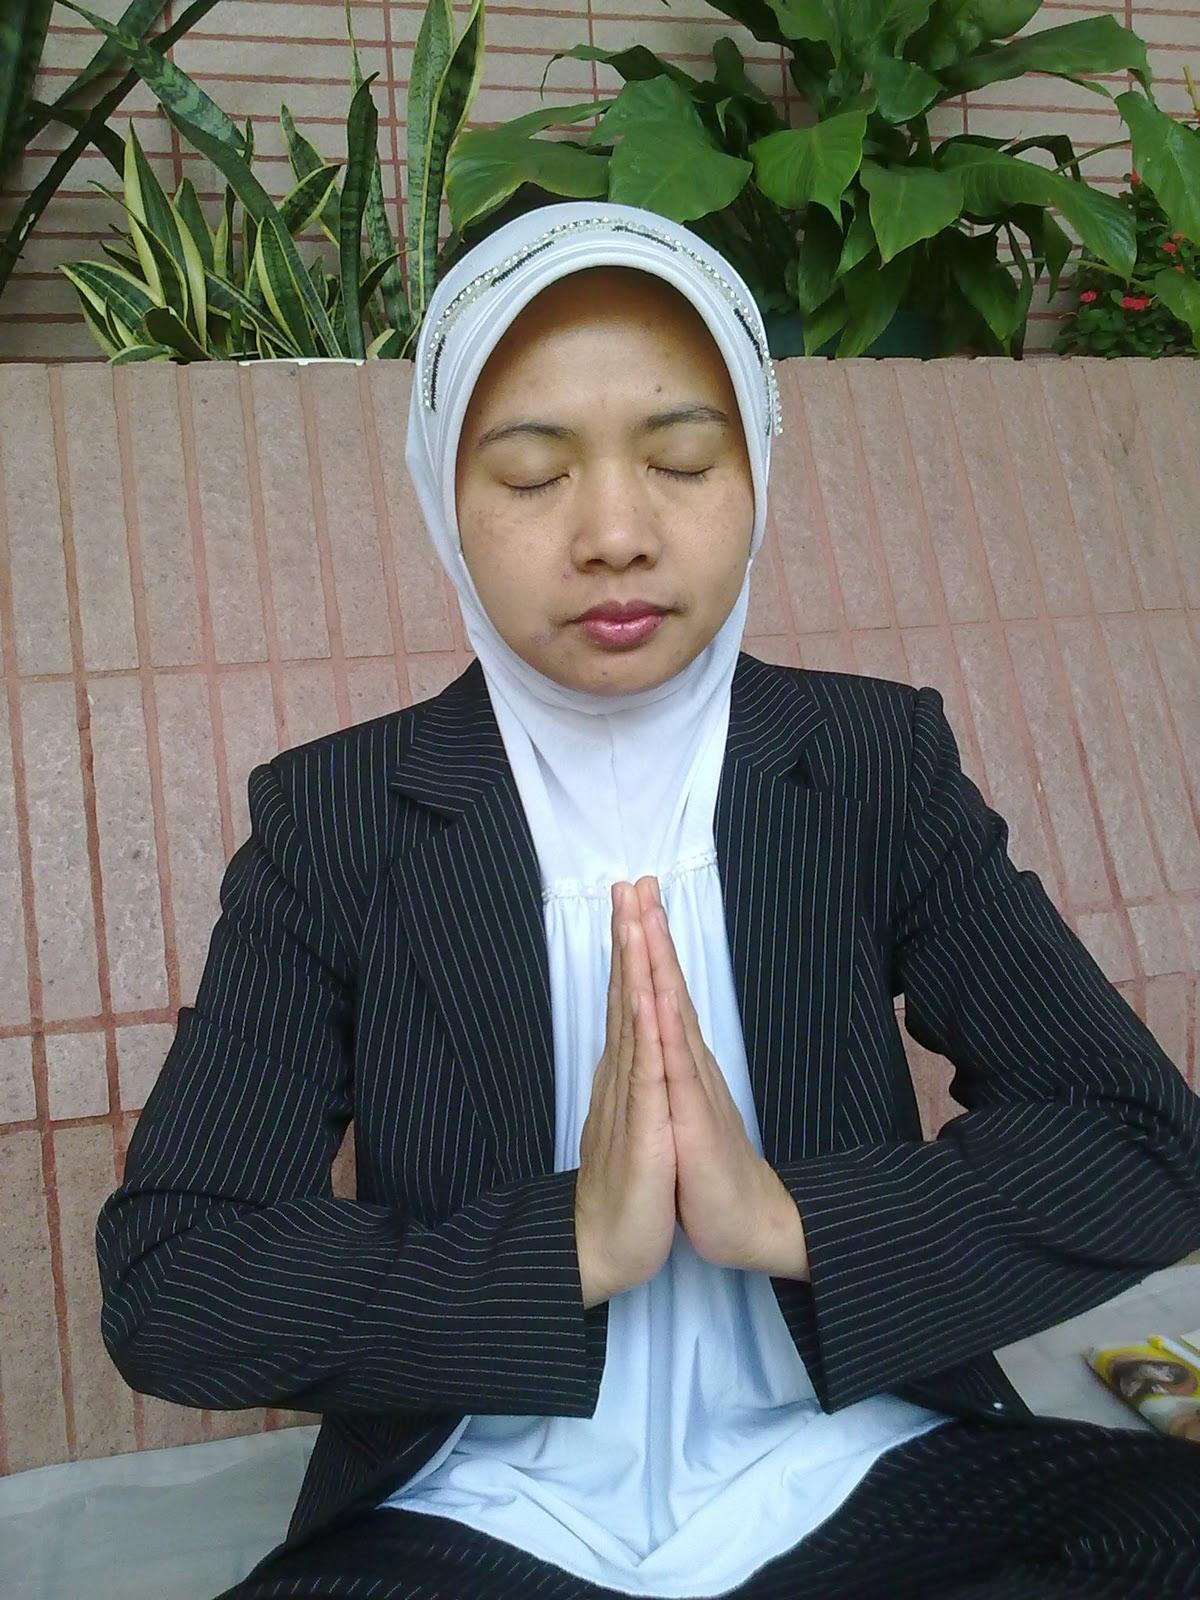 Zikir Dan Kontemplasi Dalam Tasawuf Doa